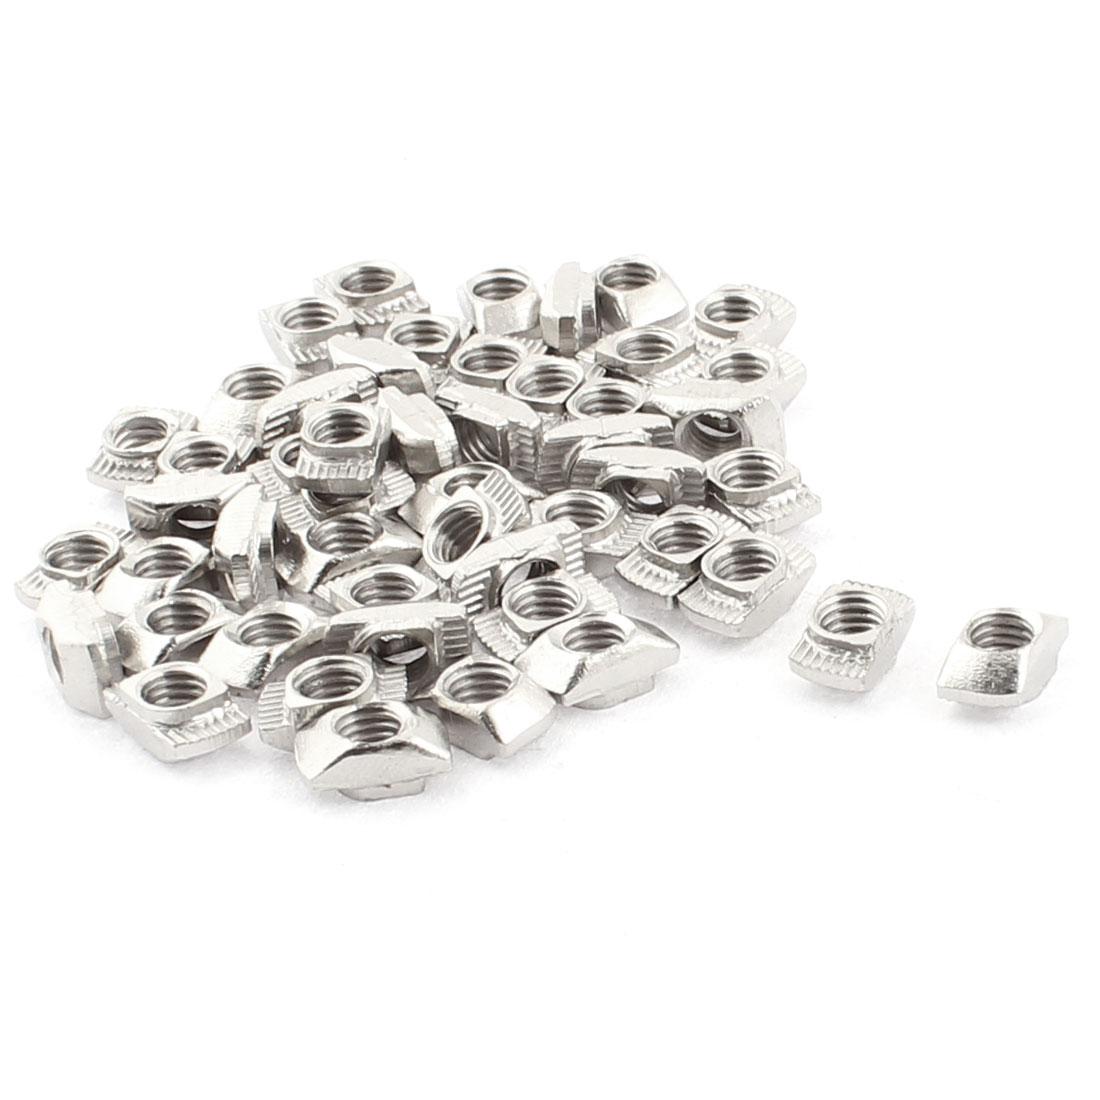 Aliexpress Buy Uxcell M5 Female Thread Metal T Slot